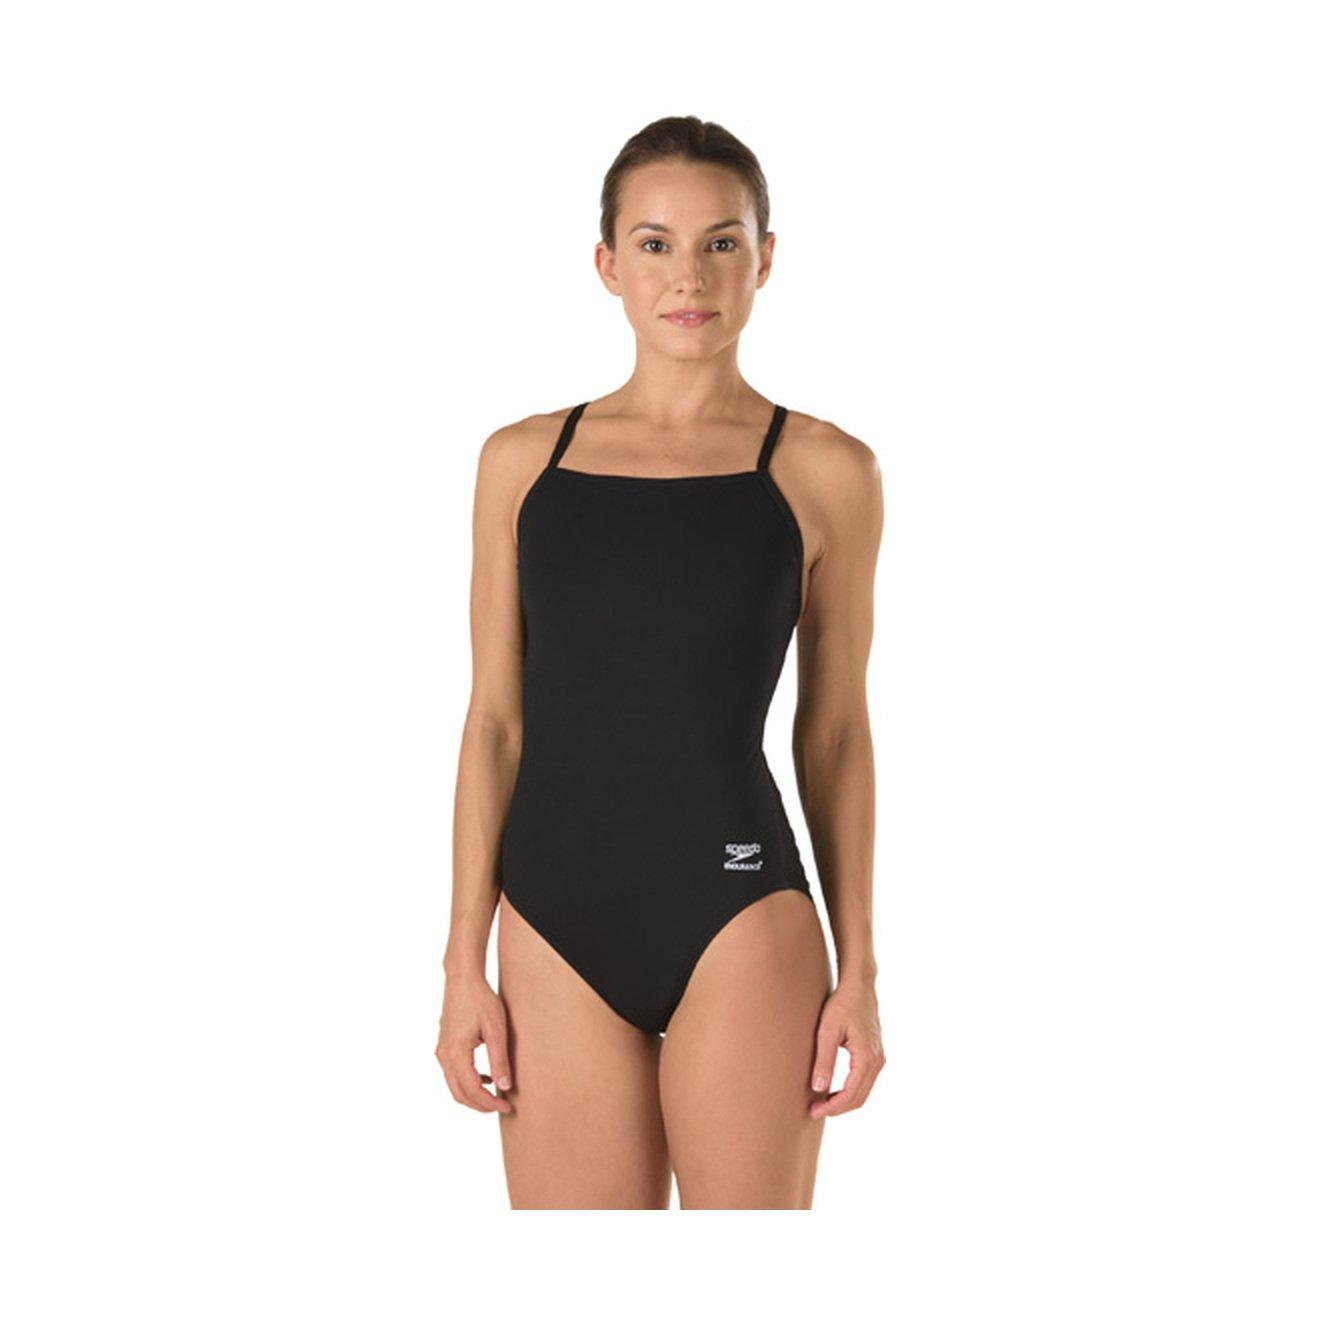 3252bcd8bd8 Speedo Black Speedo Navy. Quantity  Description. The world s leading  swimwear ...